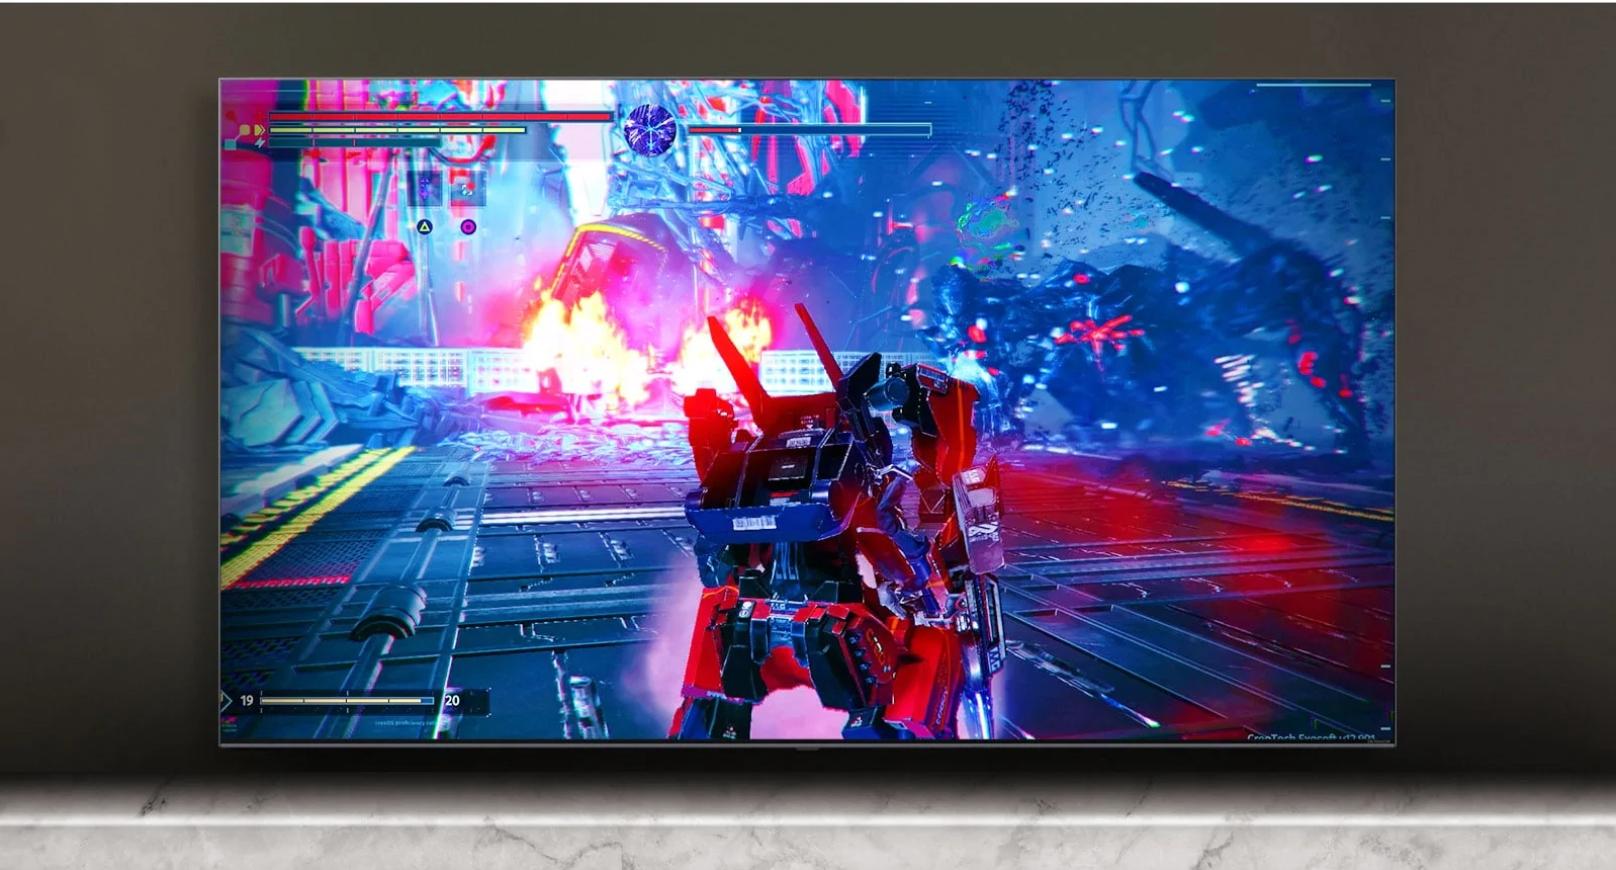 قیمت تلویزیون 49 اینچ ال جی مدل 49NANO80